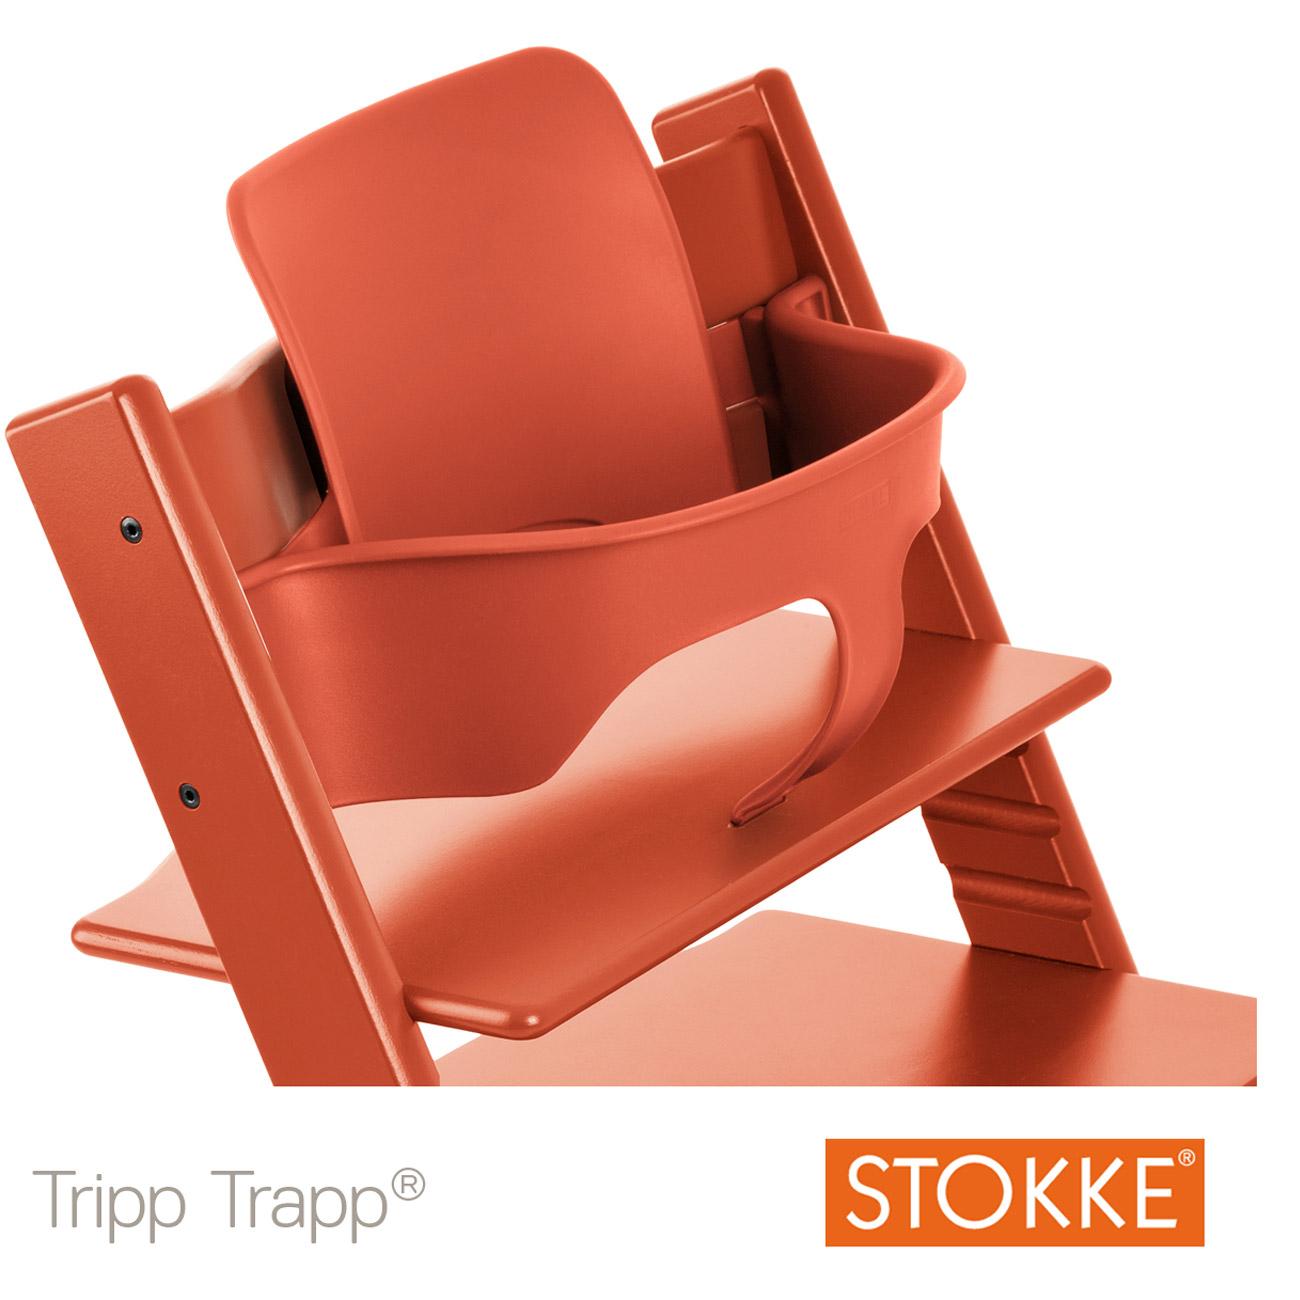 Baby Set Tripp Trapp Patin Orange Lava De Stokke Chaises